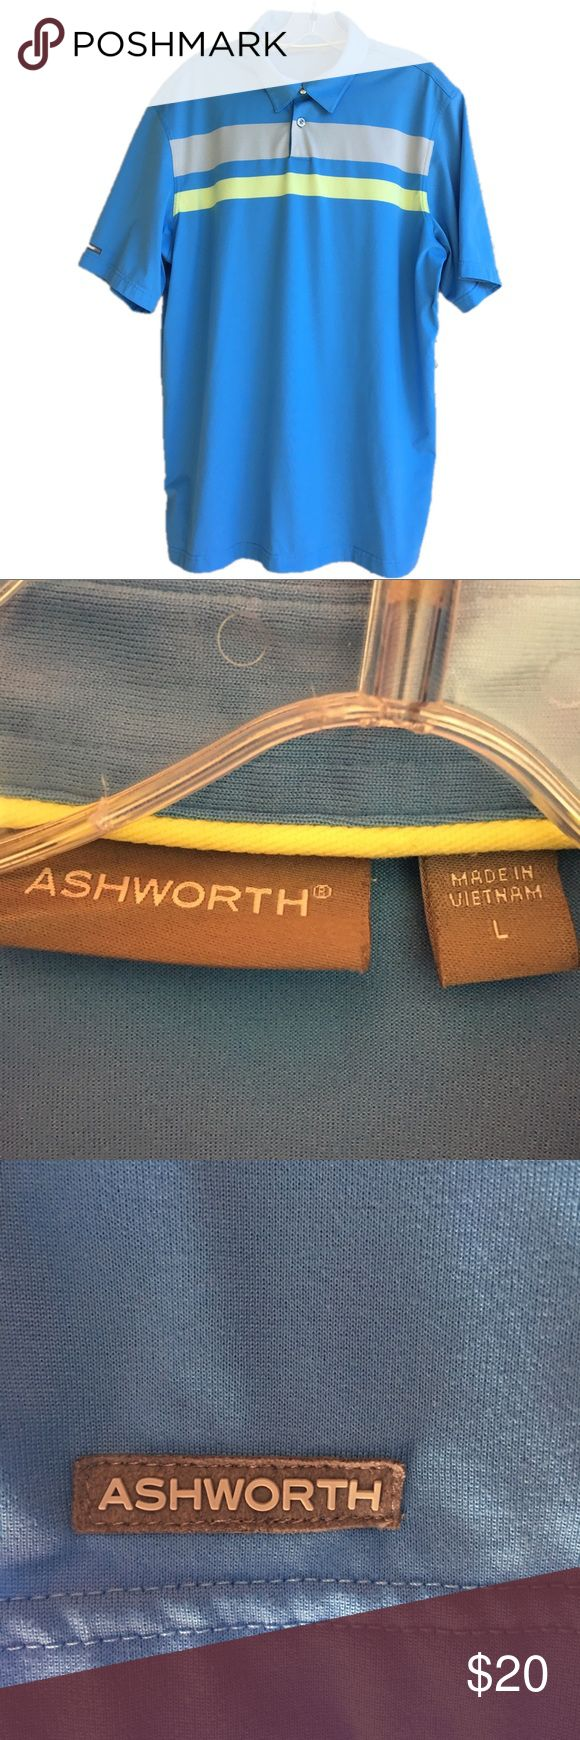 Ashworth Golf Polo Copen blue poly knit 2-button golf polo with yellow/gray horizontal stripes across chest. EUC. Ashworth Shirts Polos